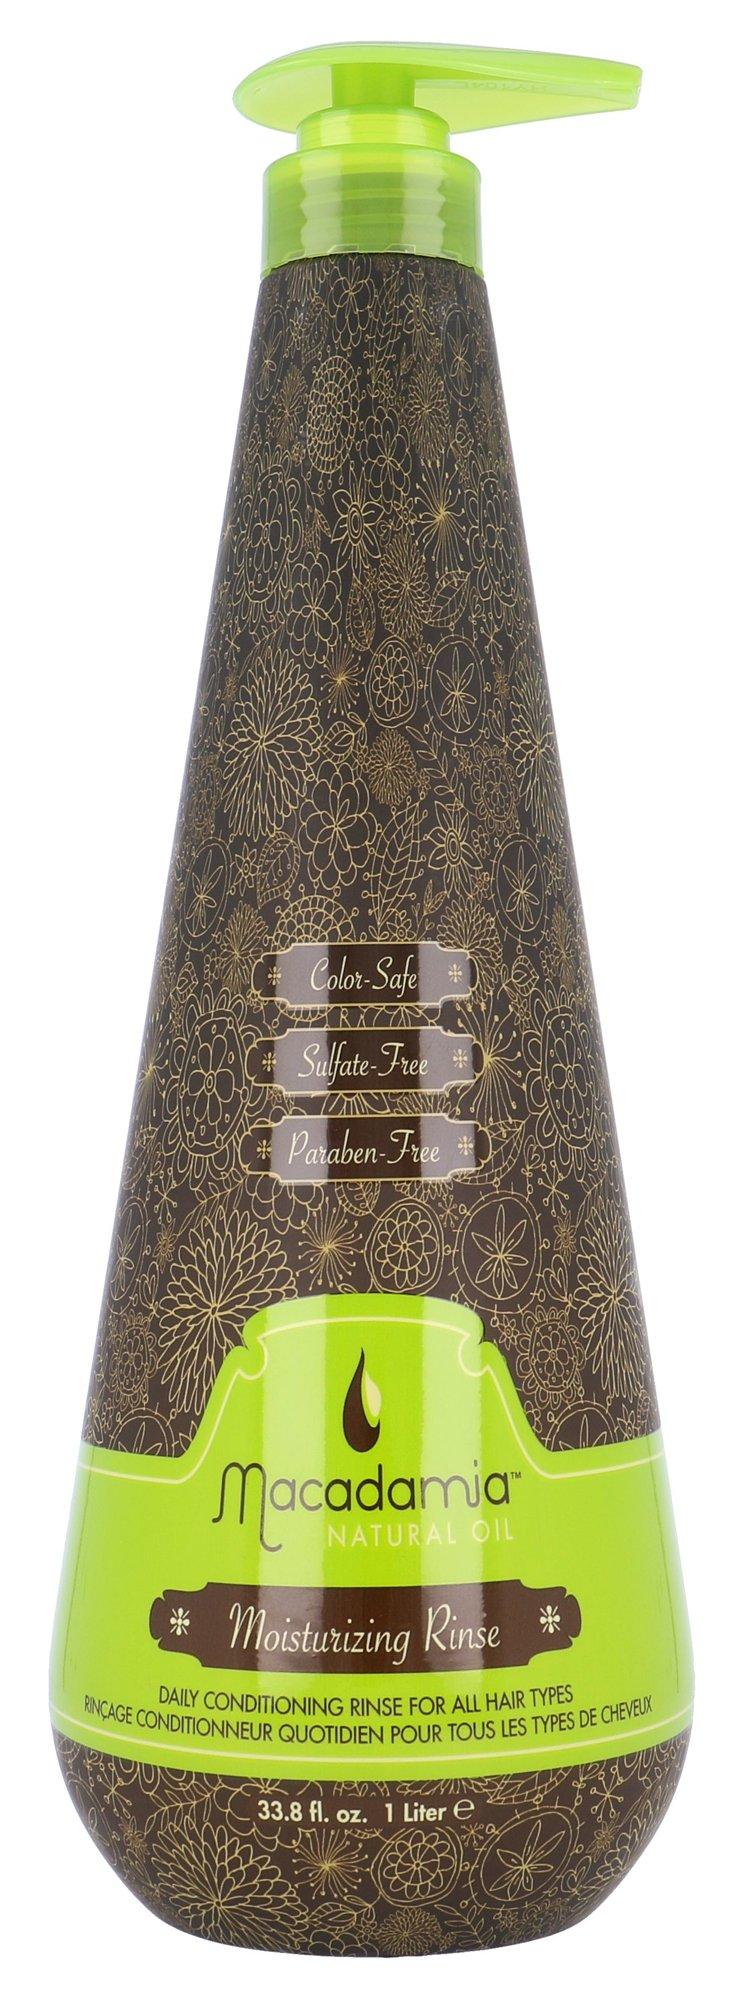 Macadamia Professional Moisturizing Rinse Cosmetic 1000ml